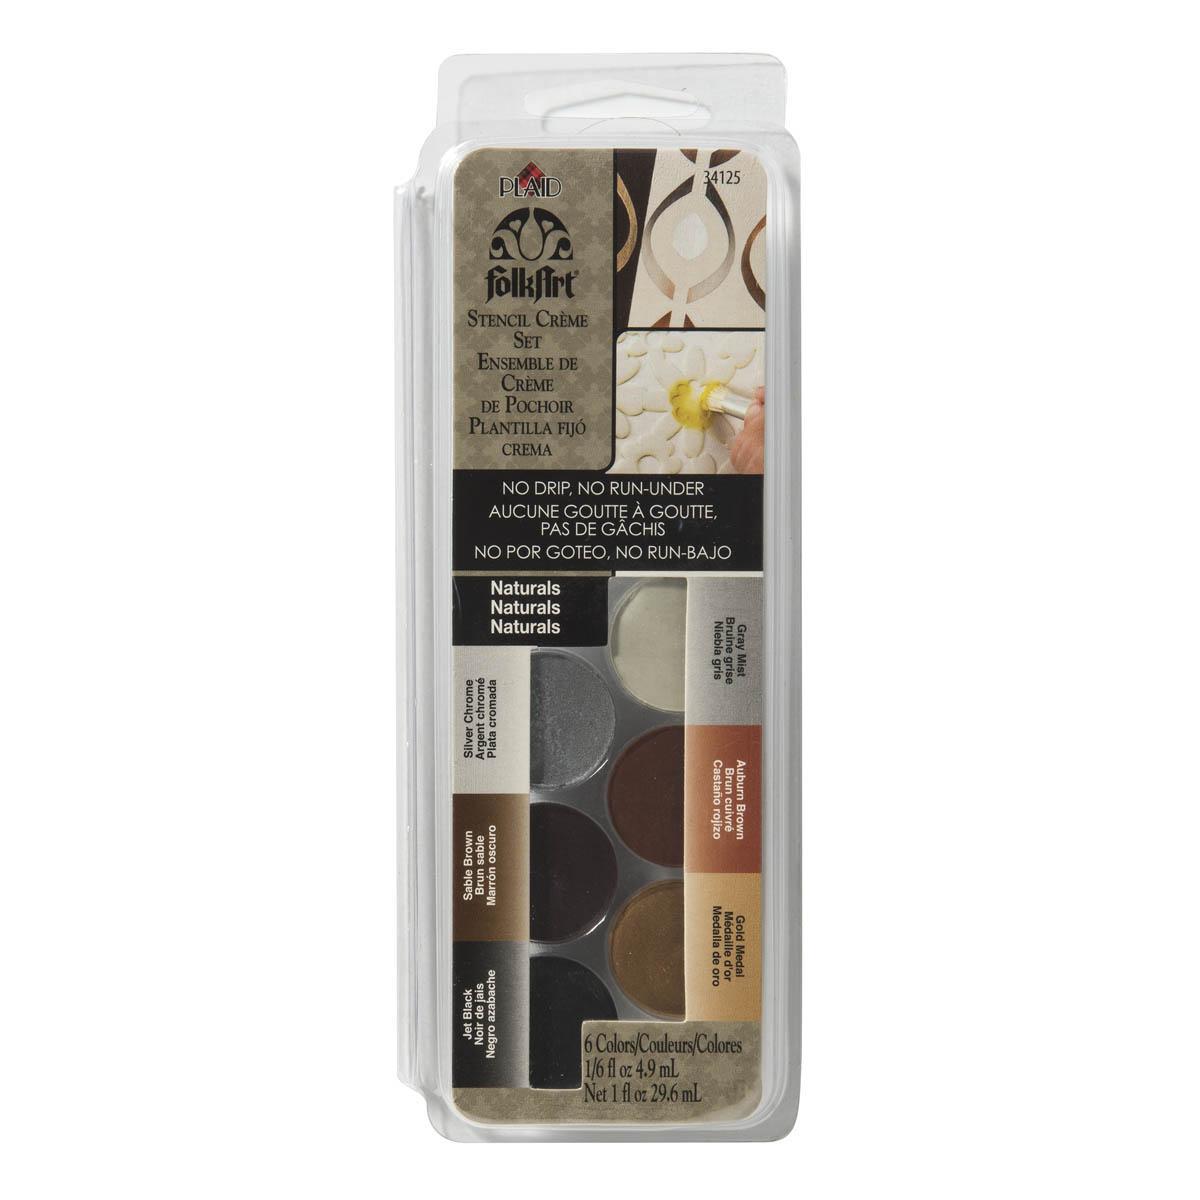 FolkArt ® Dry Brush Stencil Creme Set - Naturals - 34125